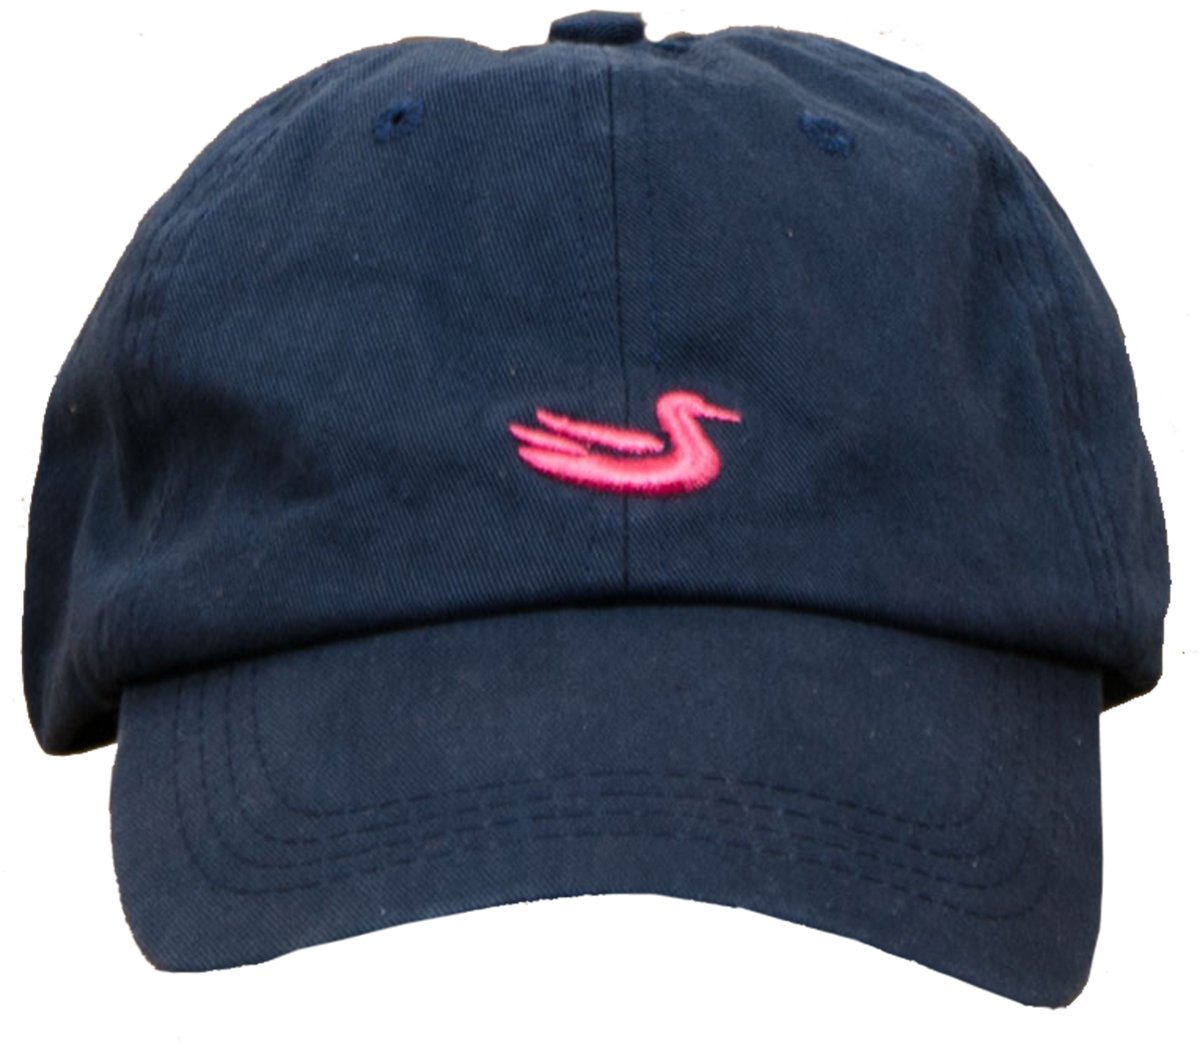 7a07d2f12f1e5 Southern Marsh Hat - Trenz Shirt Company